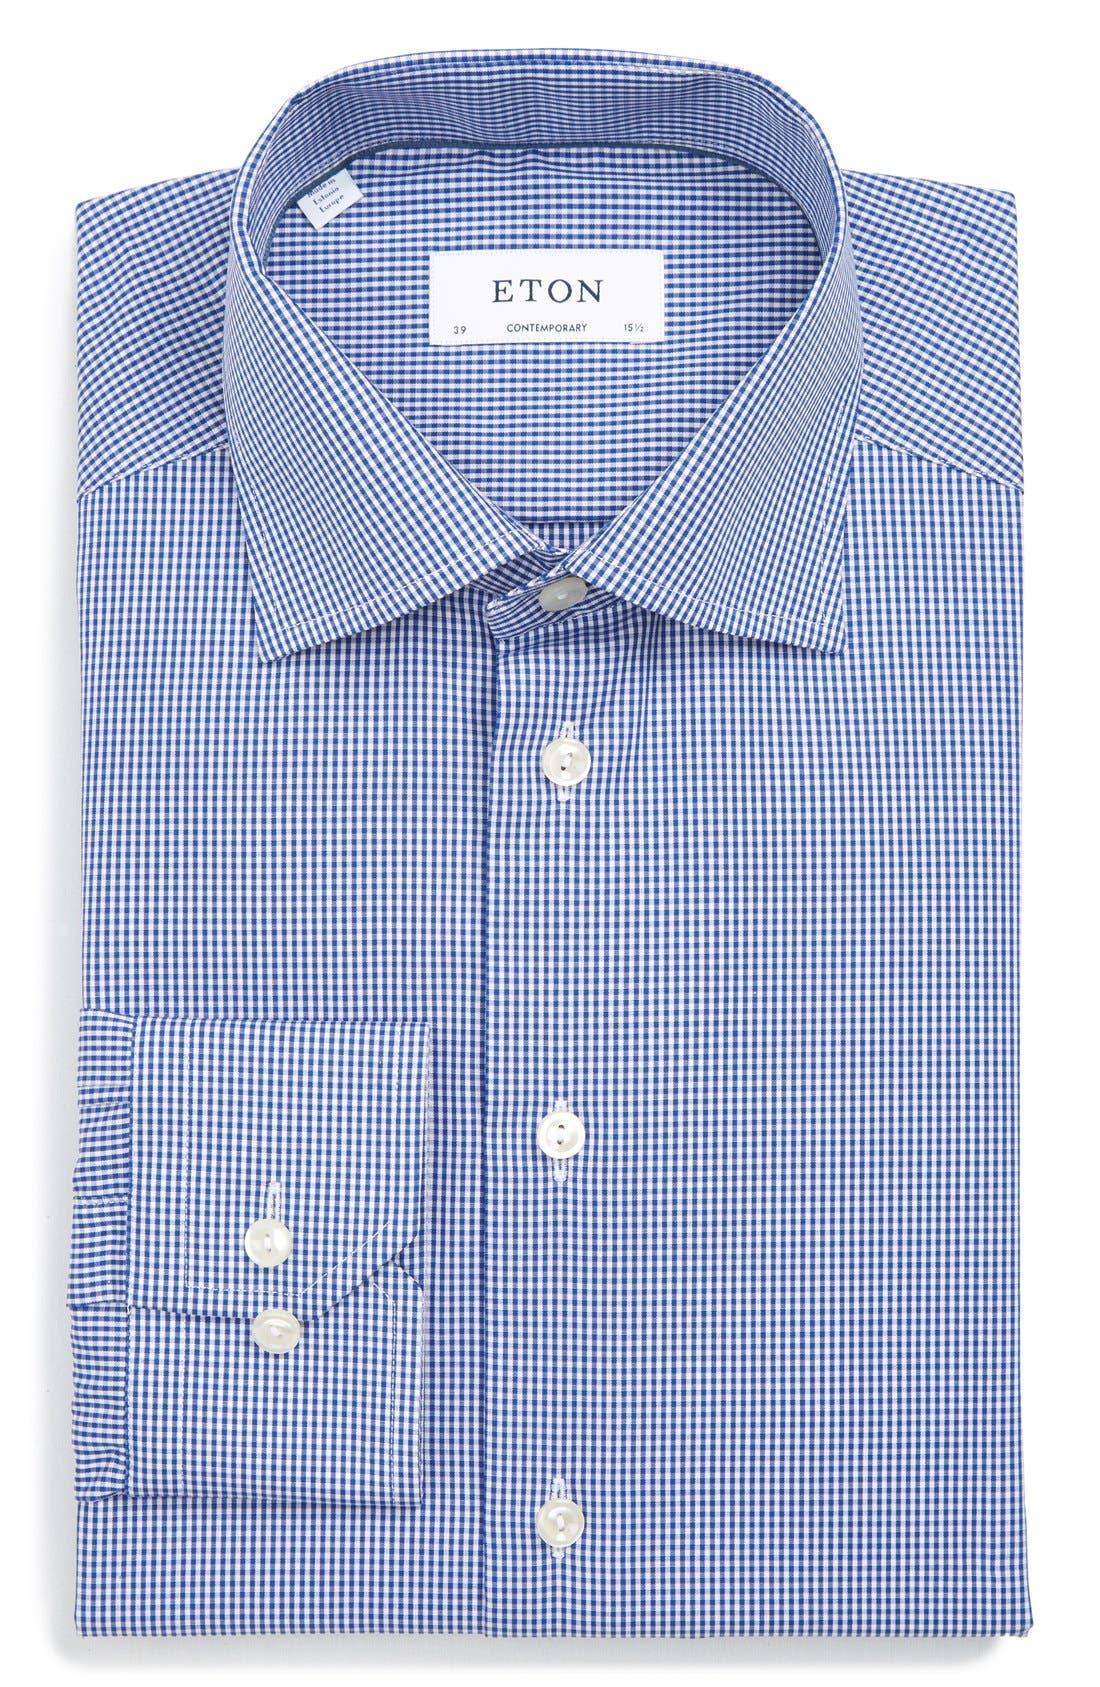 Contemporary Fit Check Dress Shirt,                             Main thumbnail 1, color,                             Mid Blue